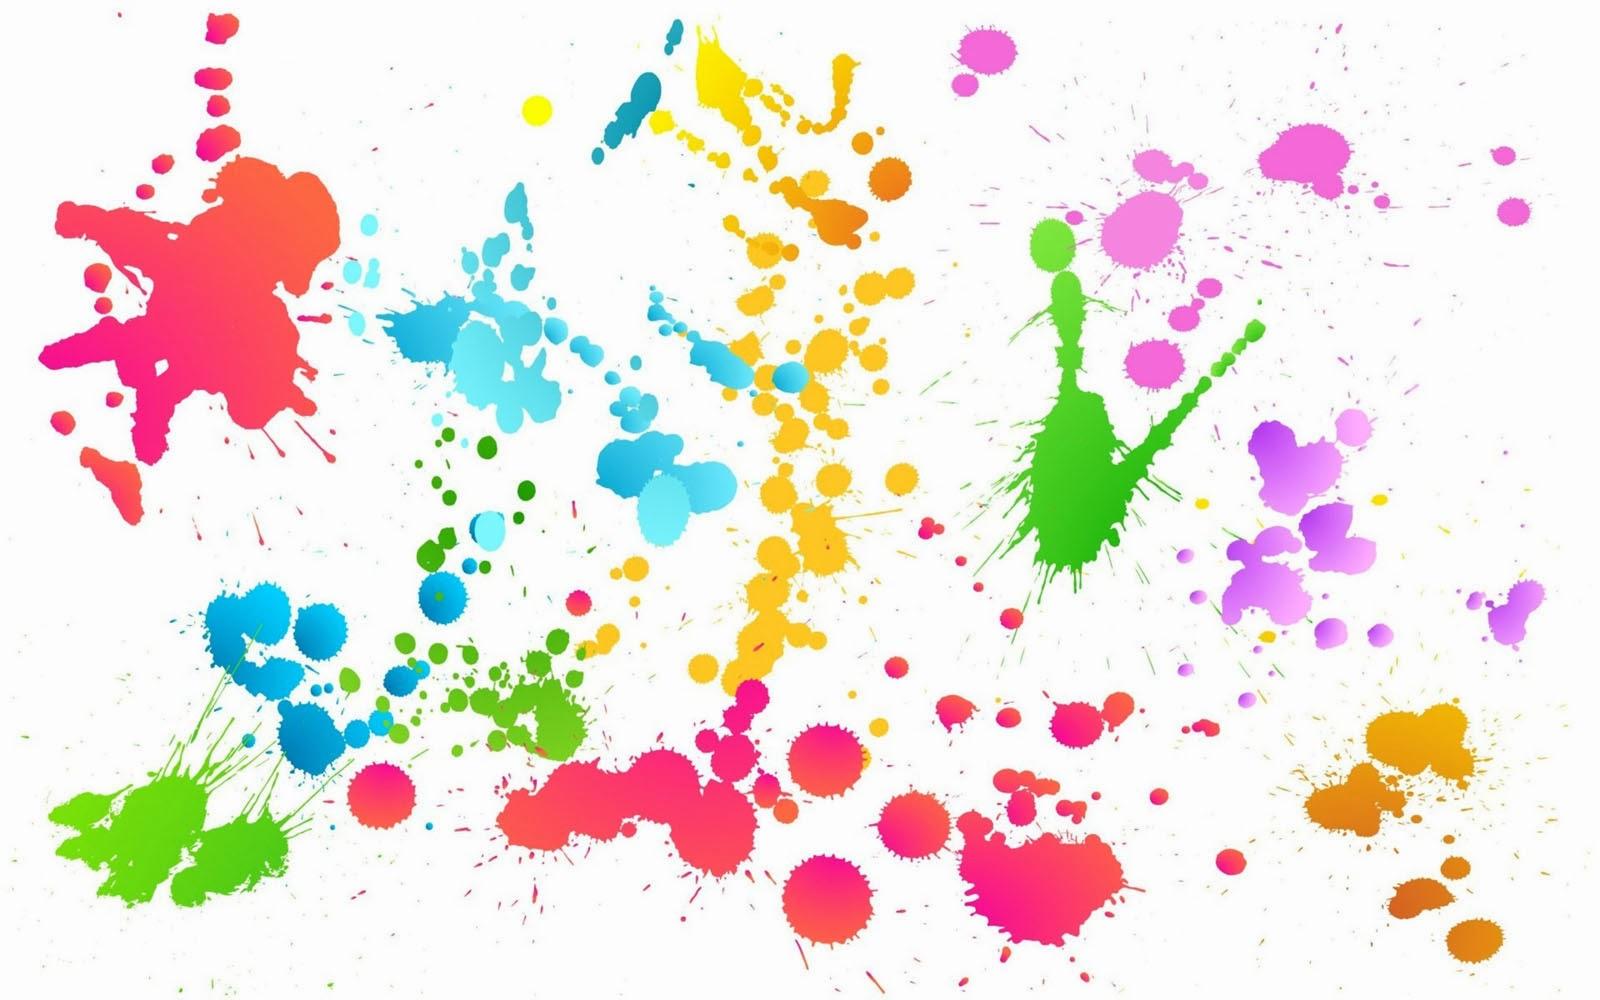 wallpapers: Color Splash Wallpapers